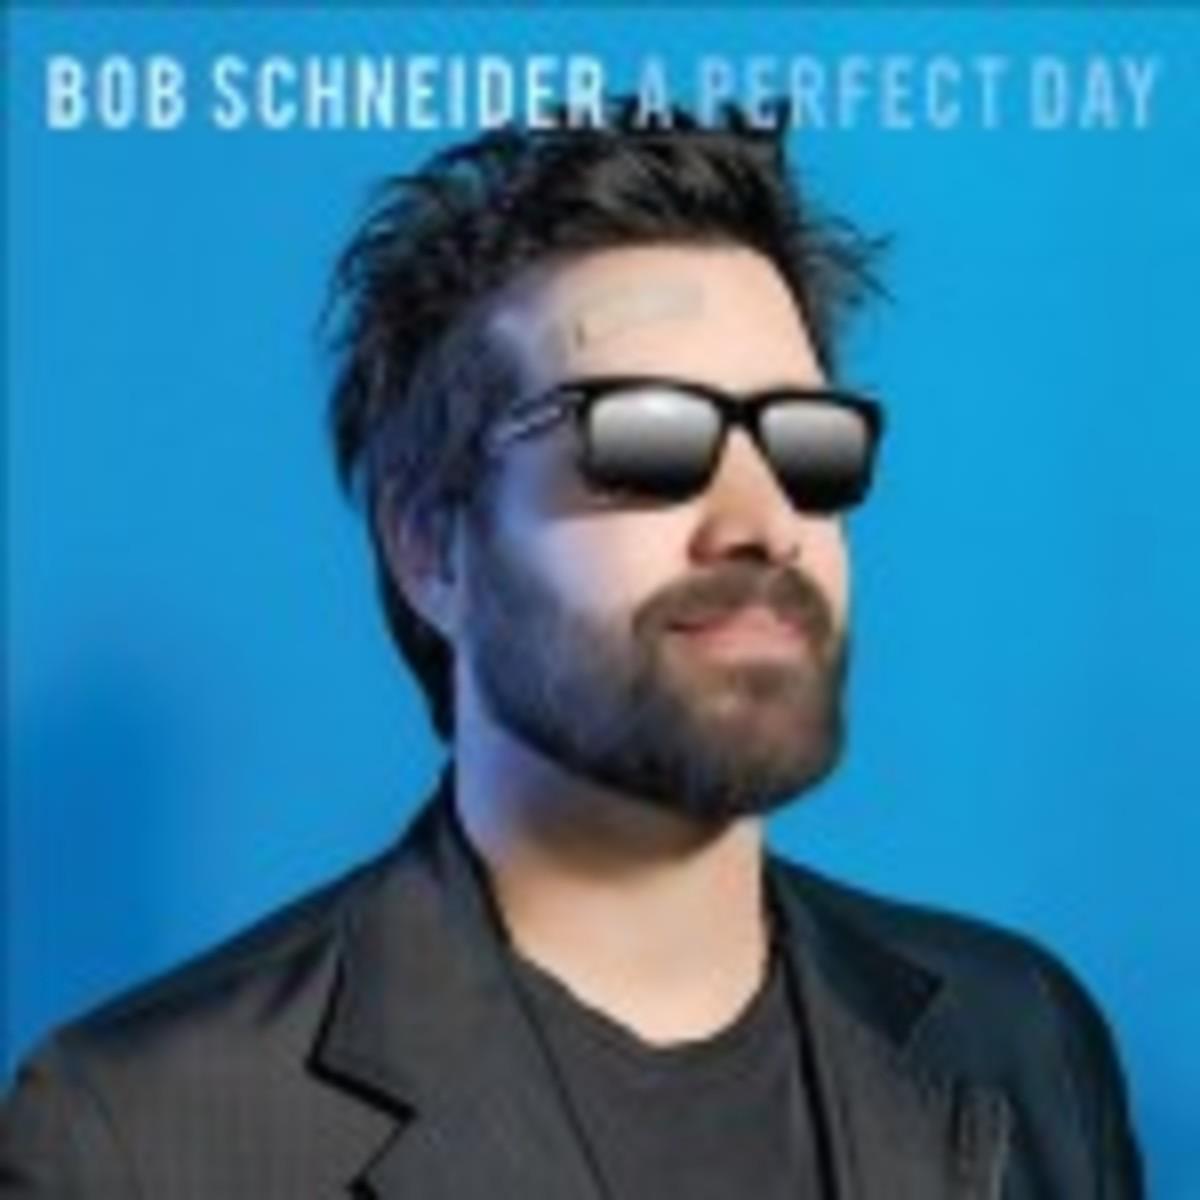 Bob Schneider_A Perfect Day